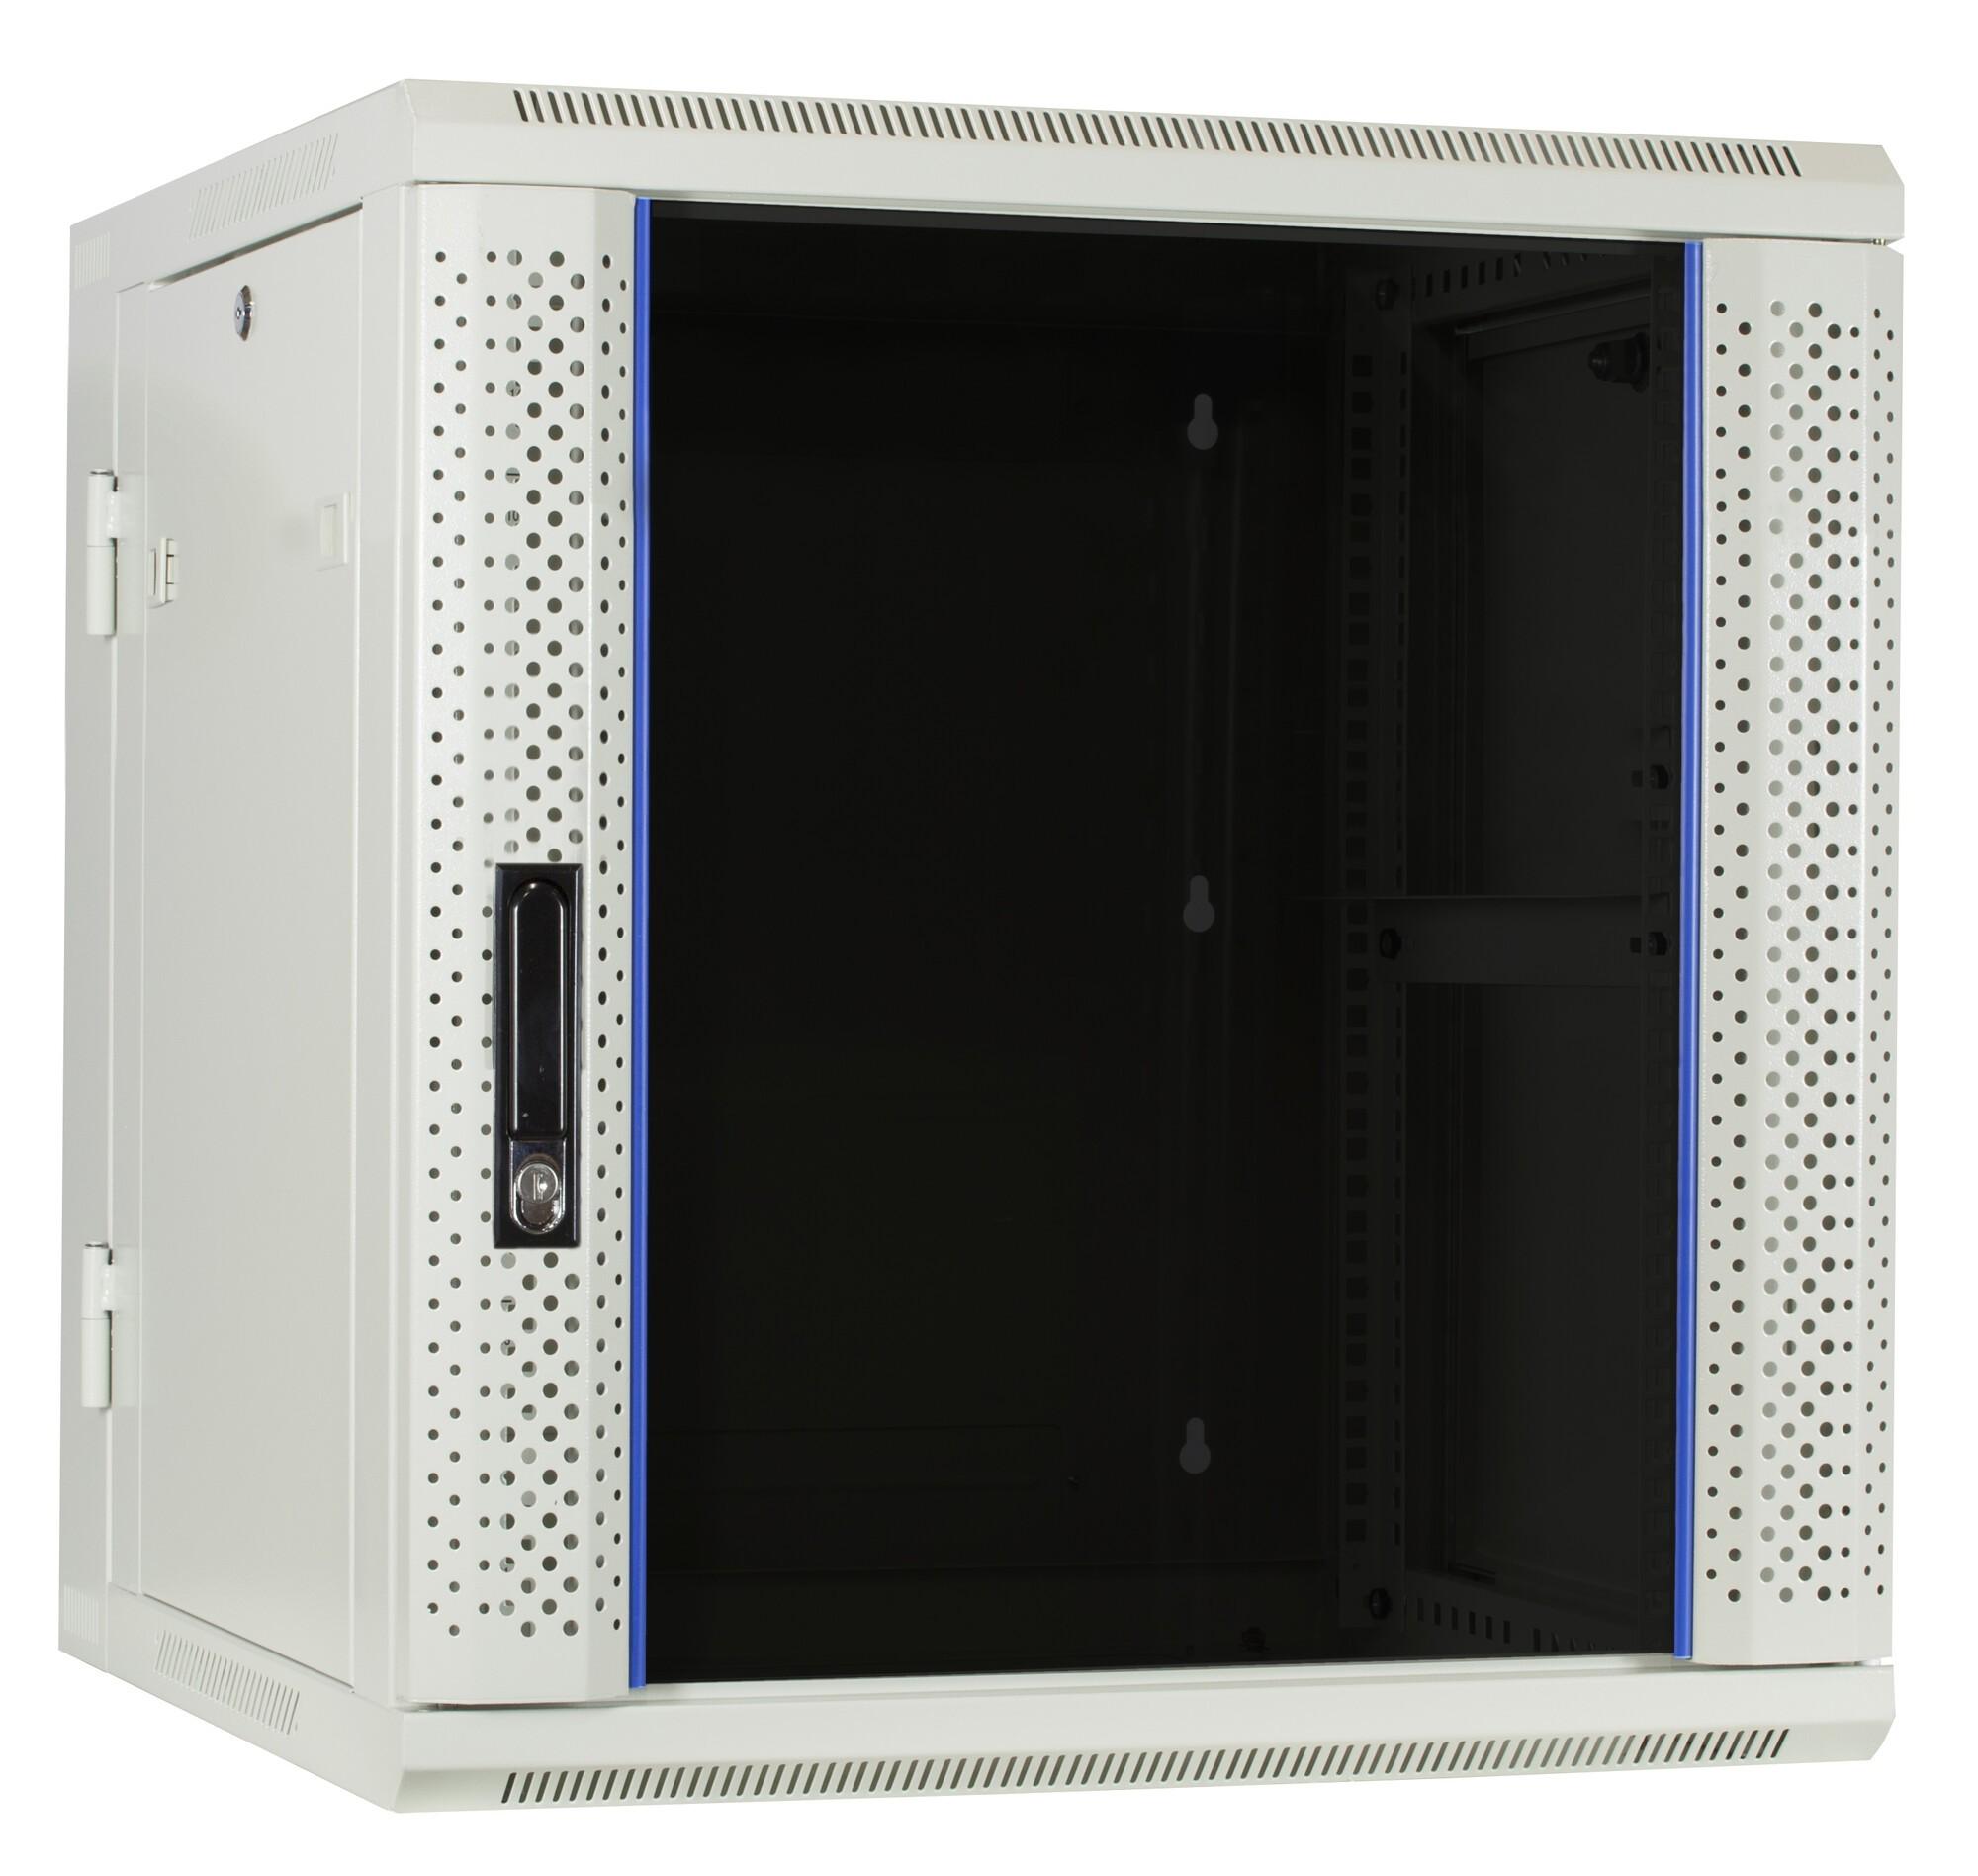 Afbeelding van 12U witte wandkast - kantelbaar met glazen deur 600x600x635mm